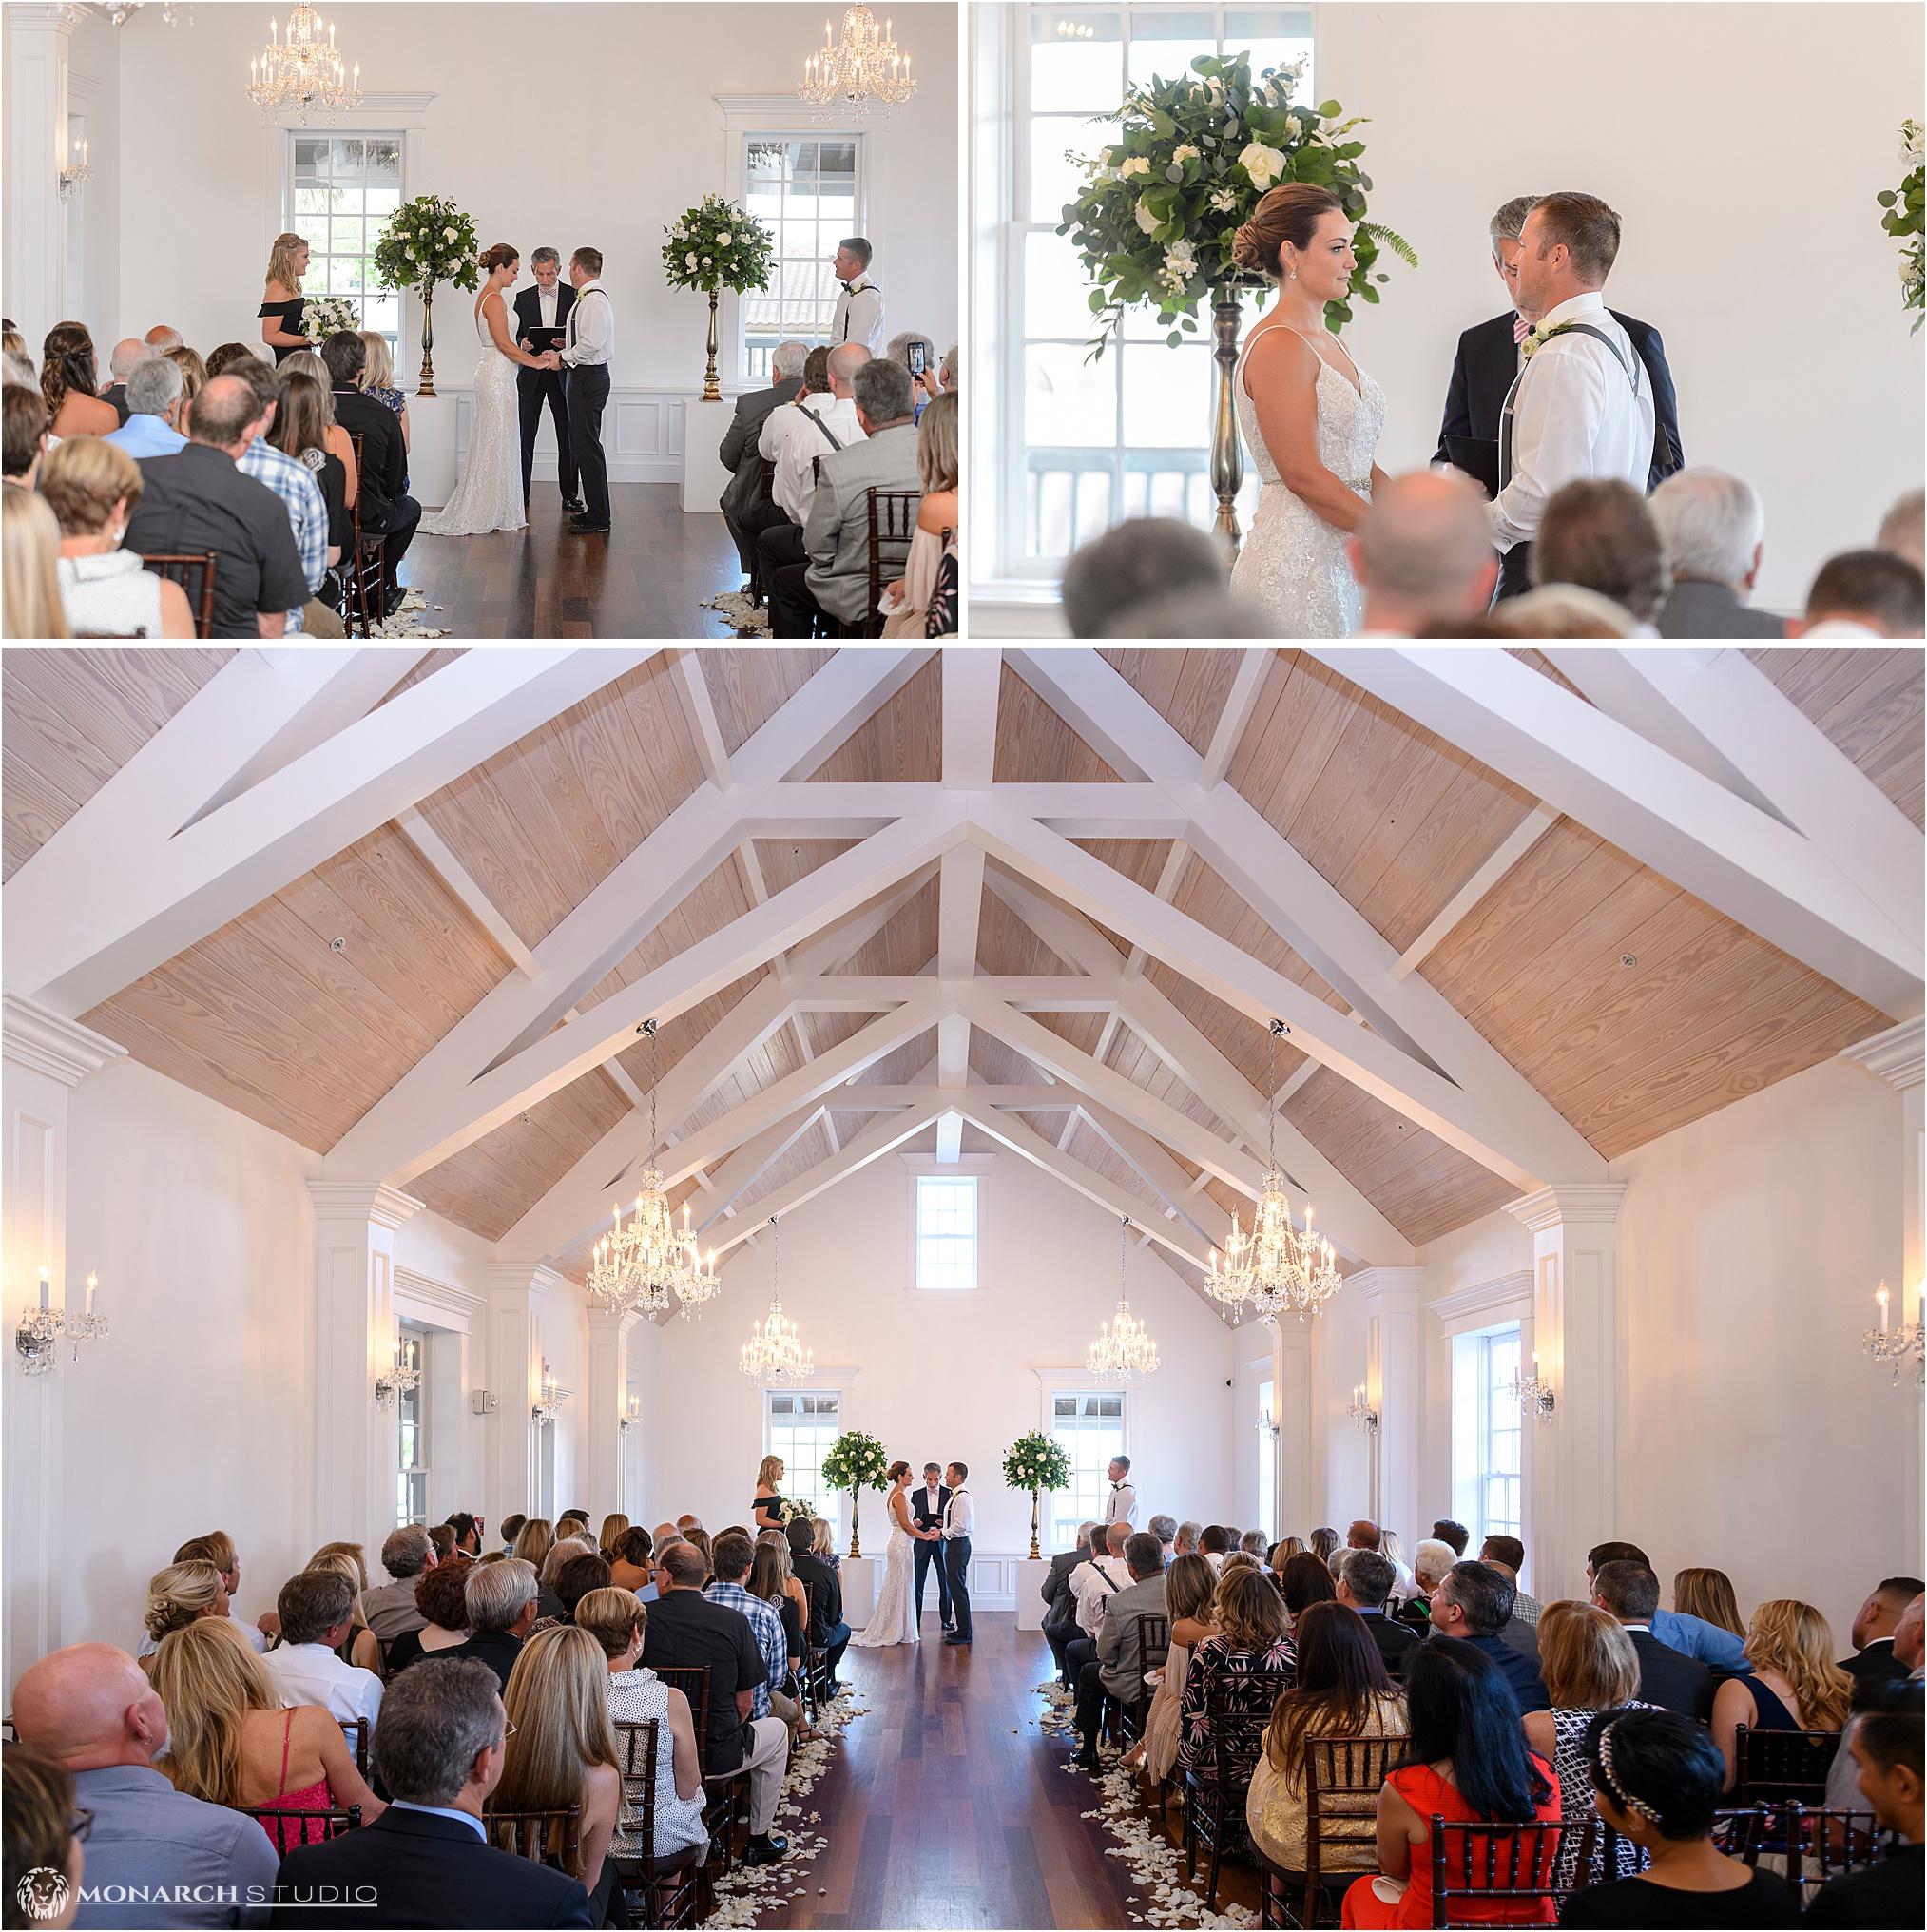 074-whiteroom-wedding-photographer-2019-05-22_0056.jpg